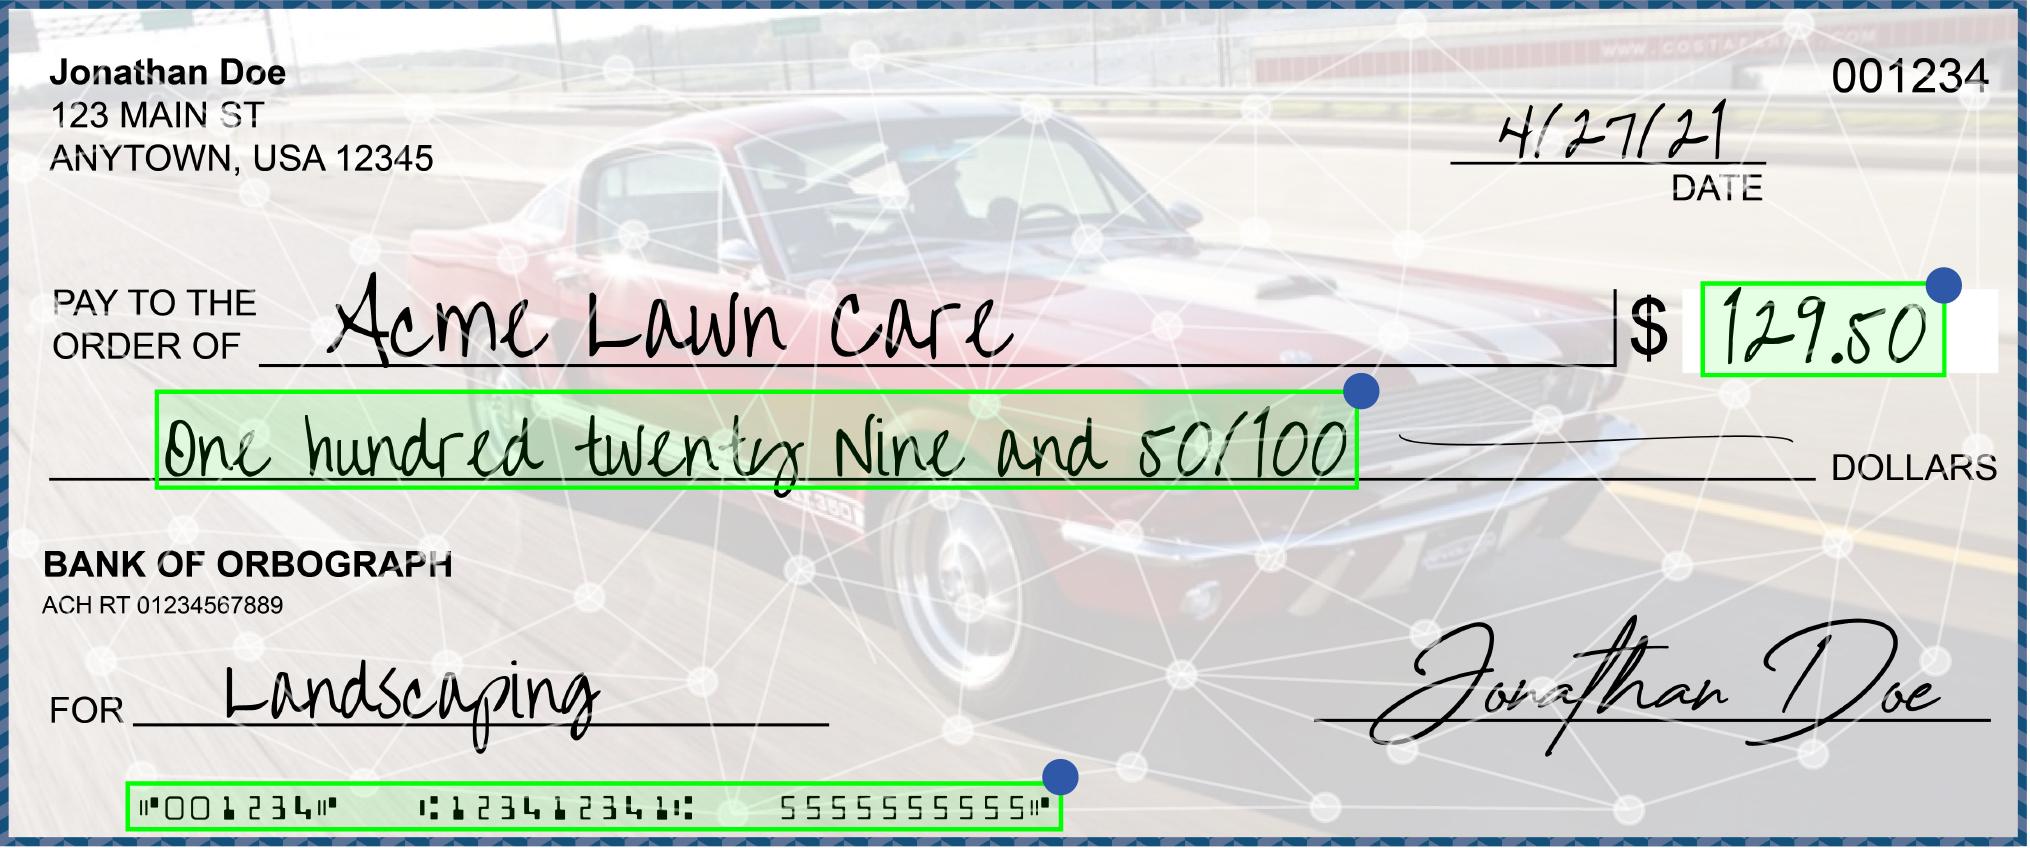 Check with CAR LAR Nodes